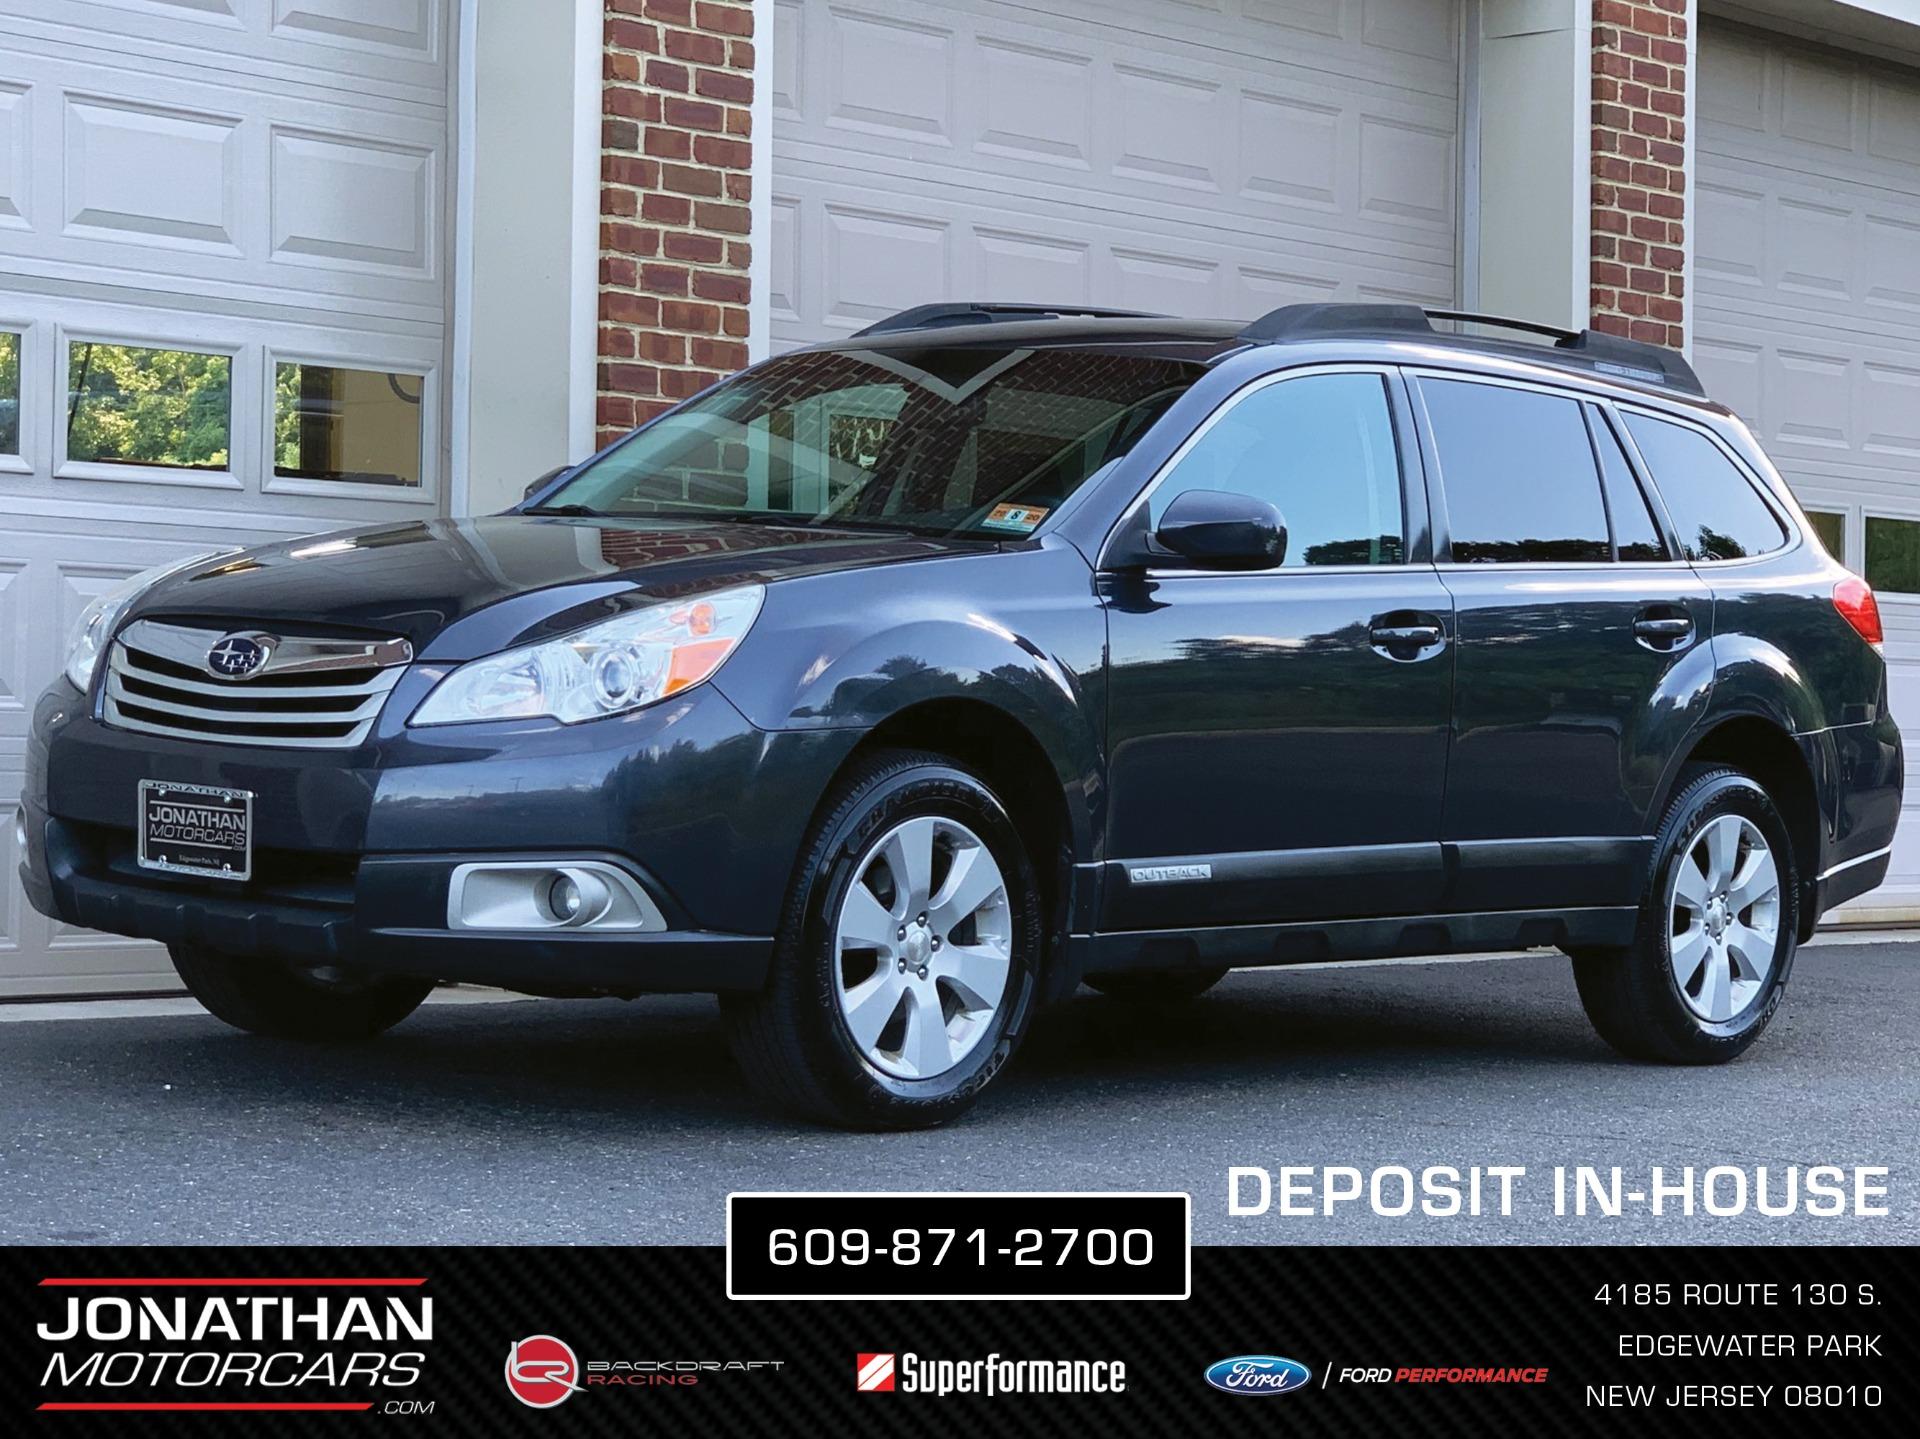 Used 2011 Subaru Outback 2.5i Premium | Edgewater Park, NJ